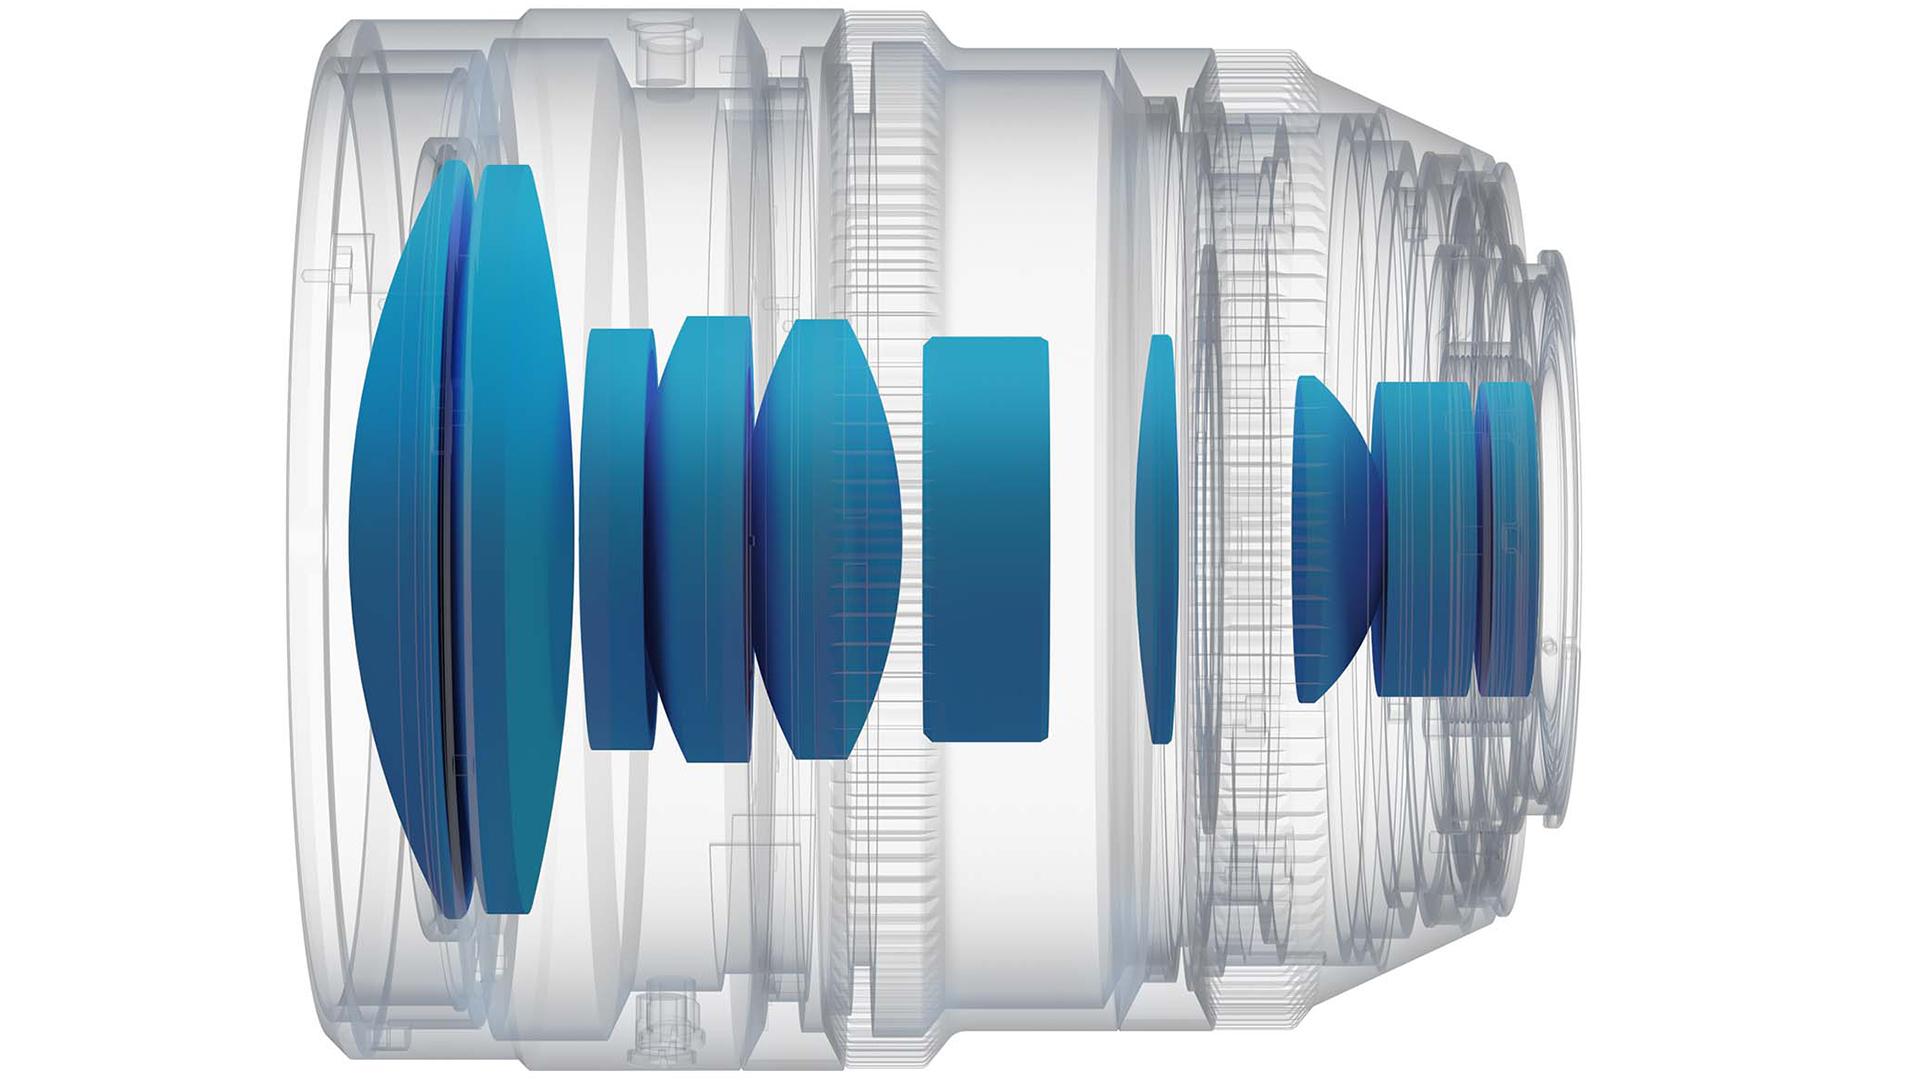 Оптическая схема объектива Irix Cine 30mm T1.5